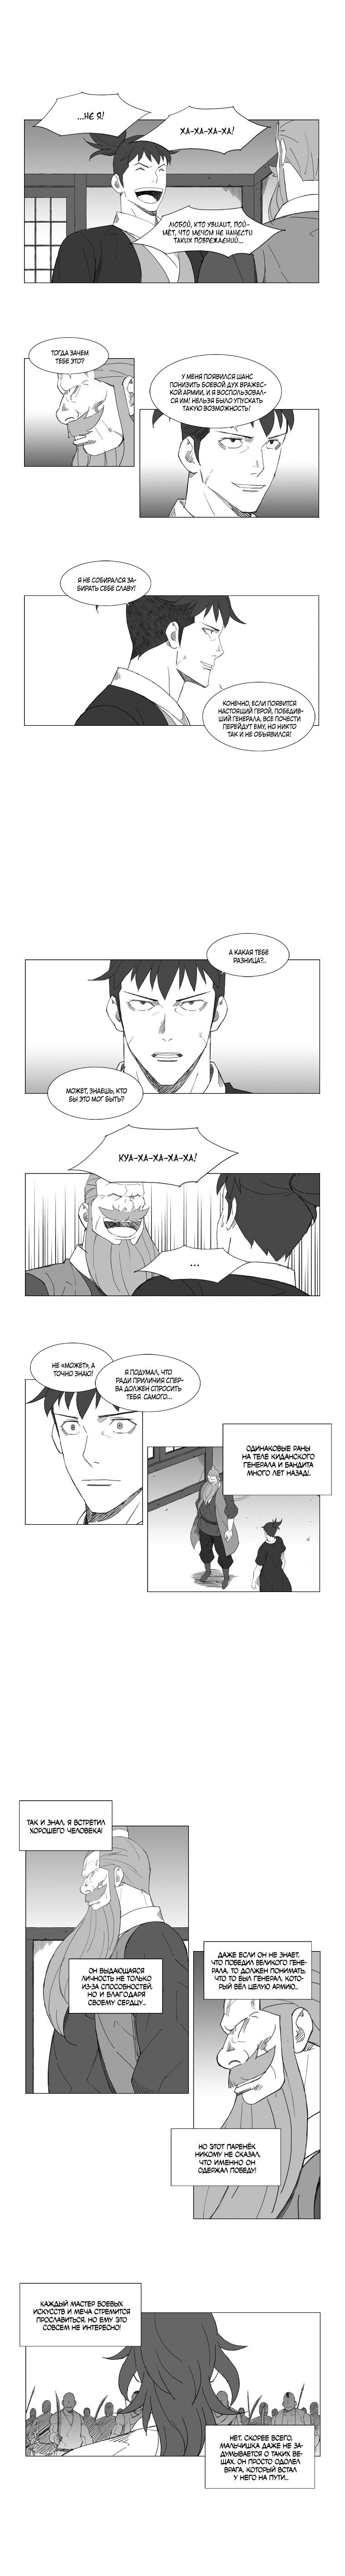 https://r1.ninemanga.com/comics/pic2/39/28263/336515/150963929338.jpg Page 3